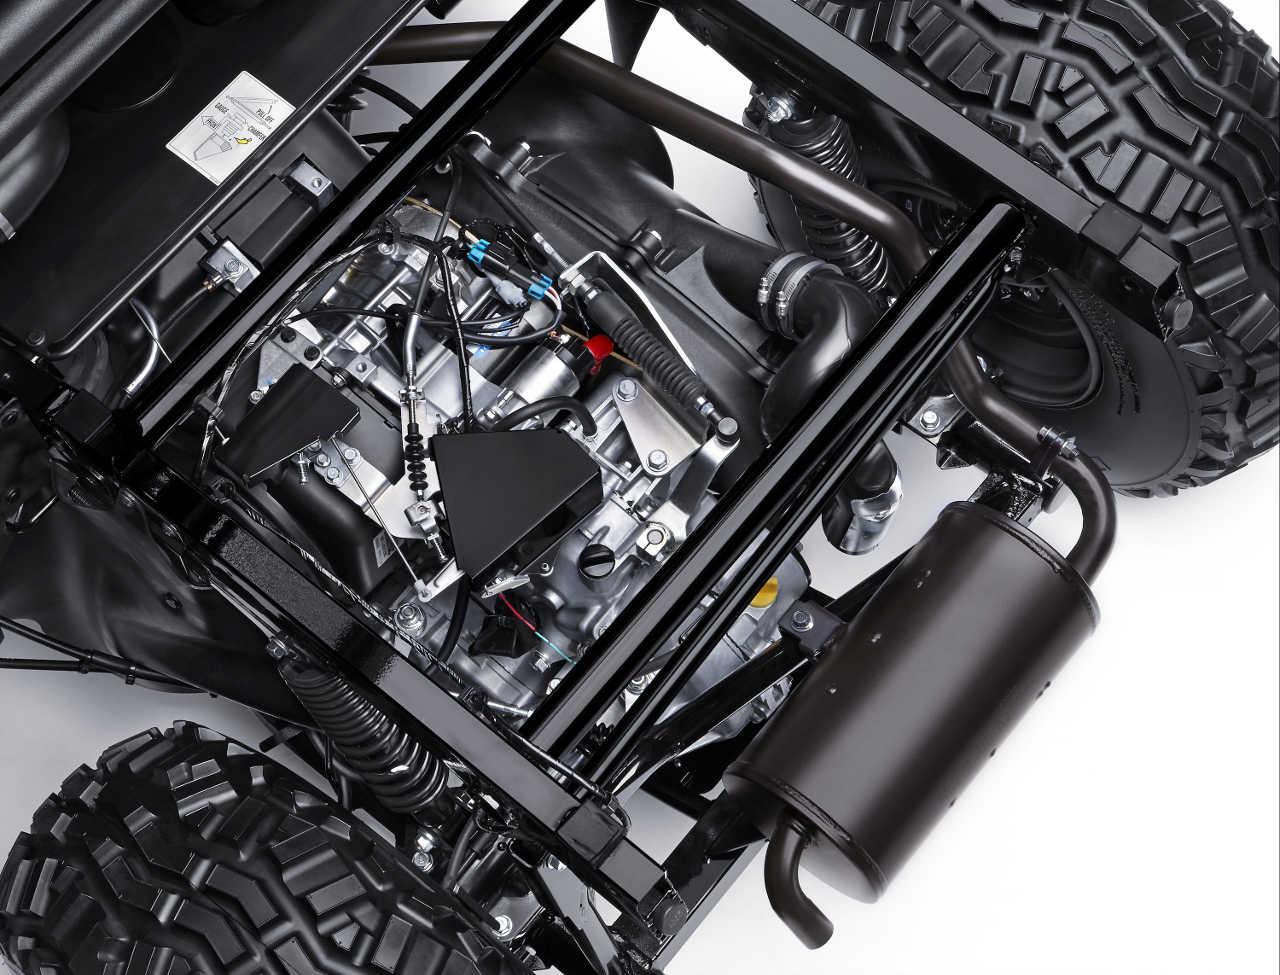 sea doo jet ski parts diagram meyer truck lite wiring kawasaki 550 mule electrical schematic, kawasaki, get free image about